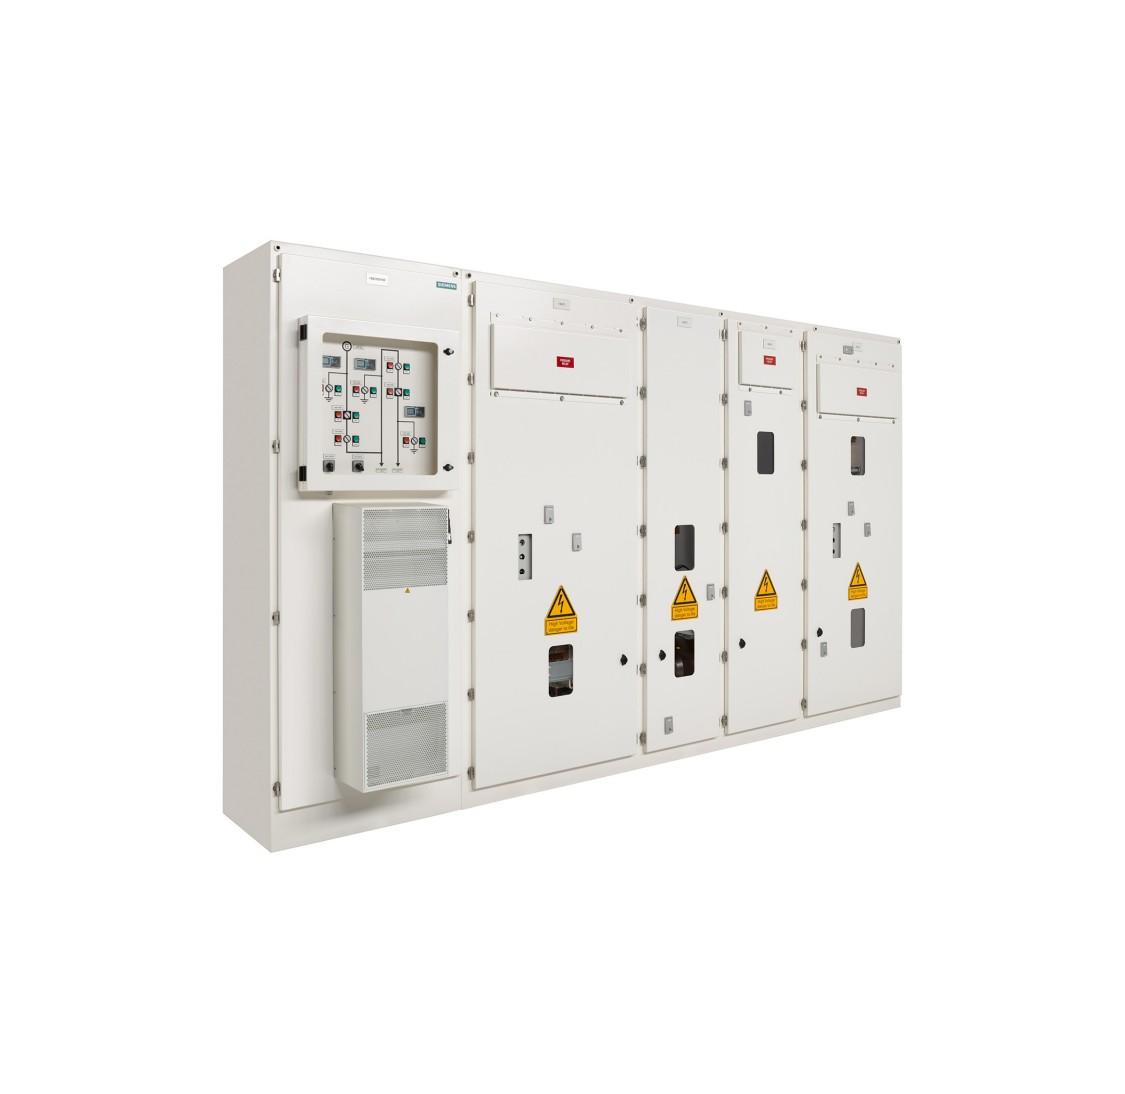 HIGS-generator switchgear